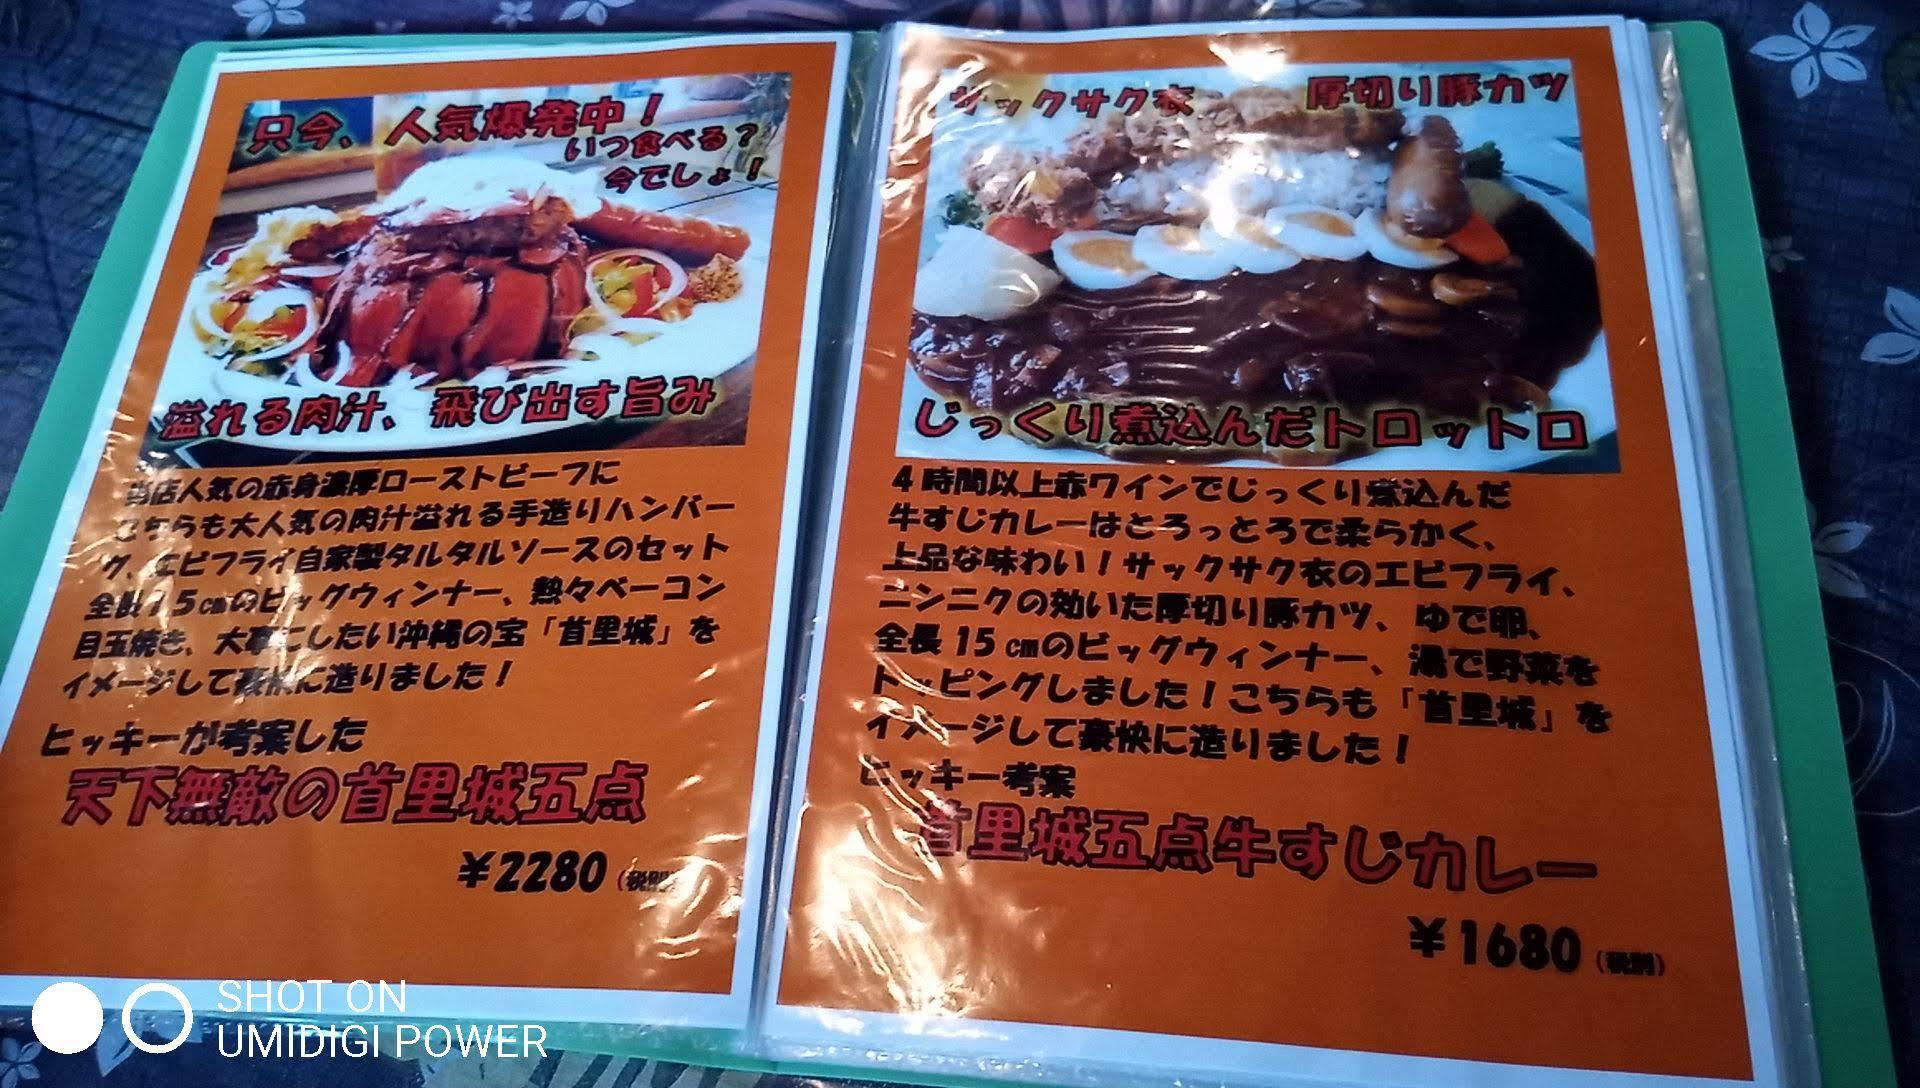 the menu of Meat Bar Hikiy's 1